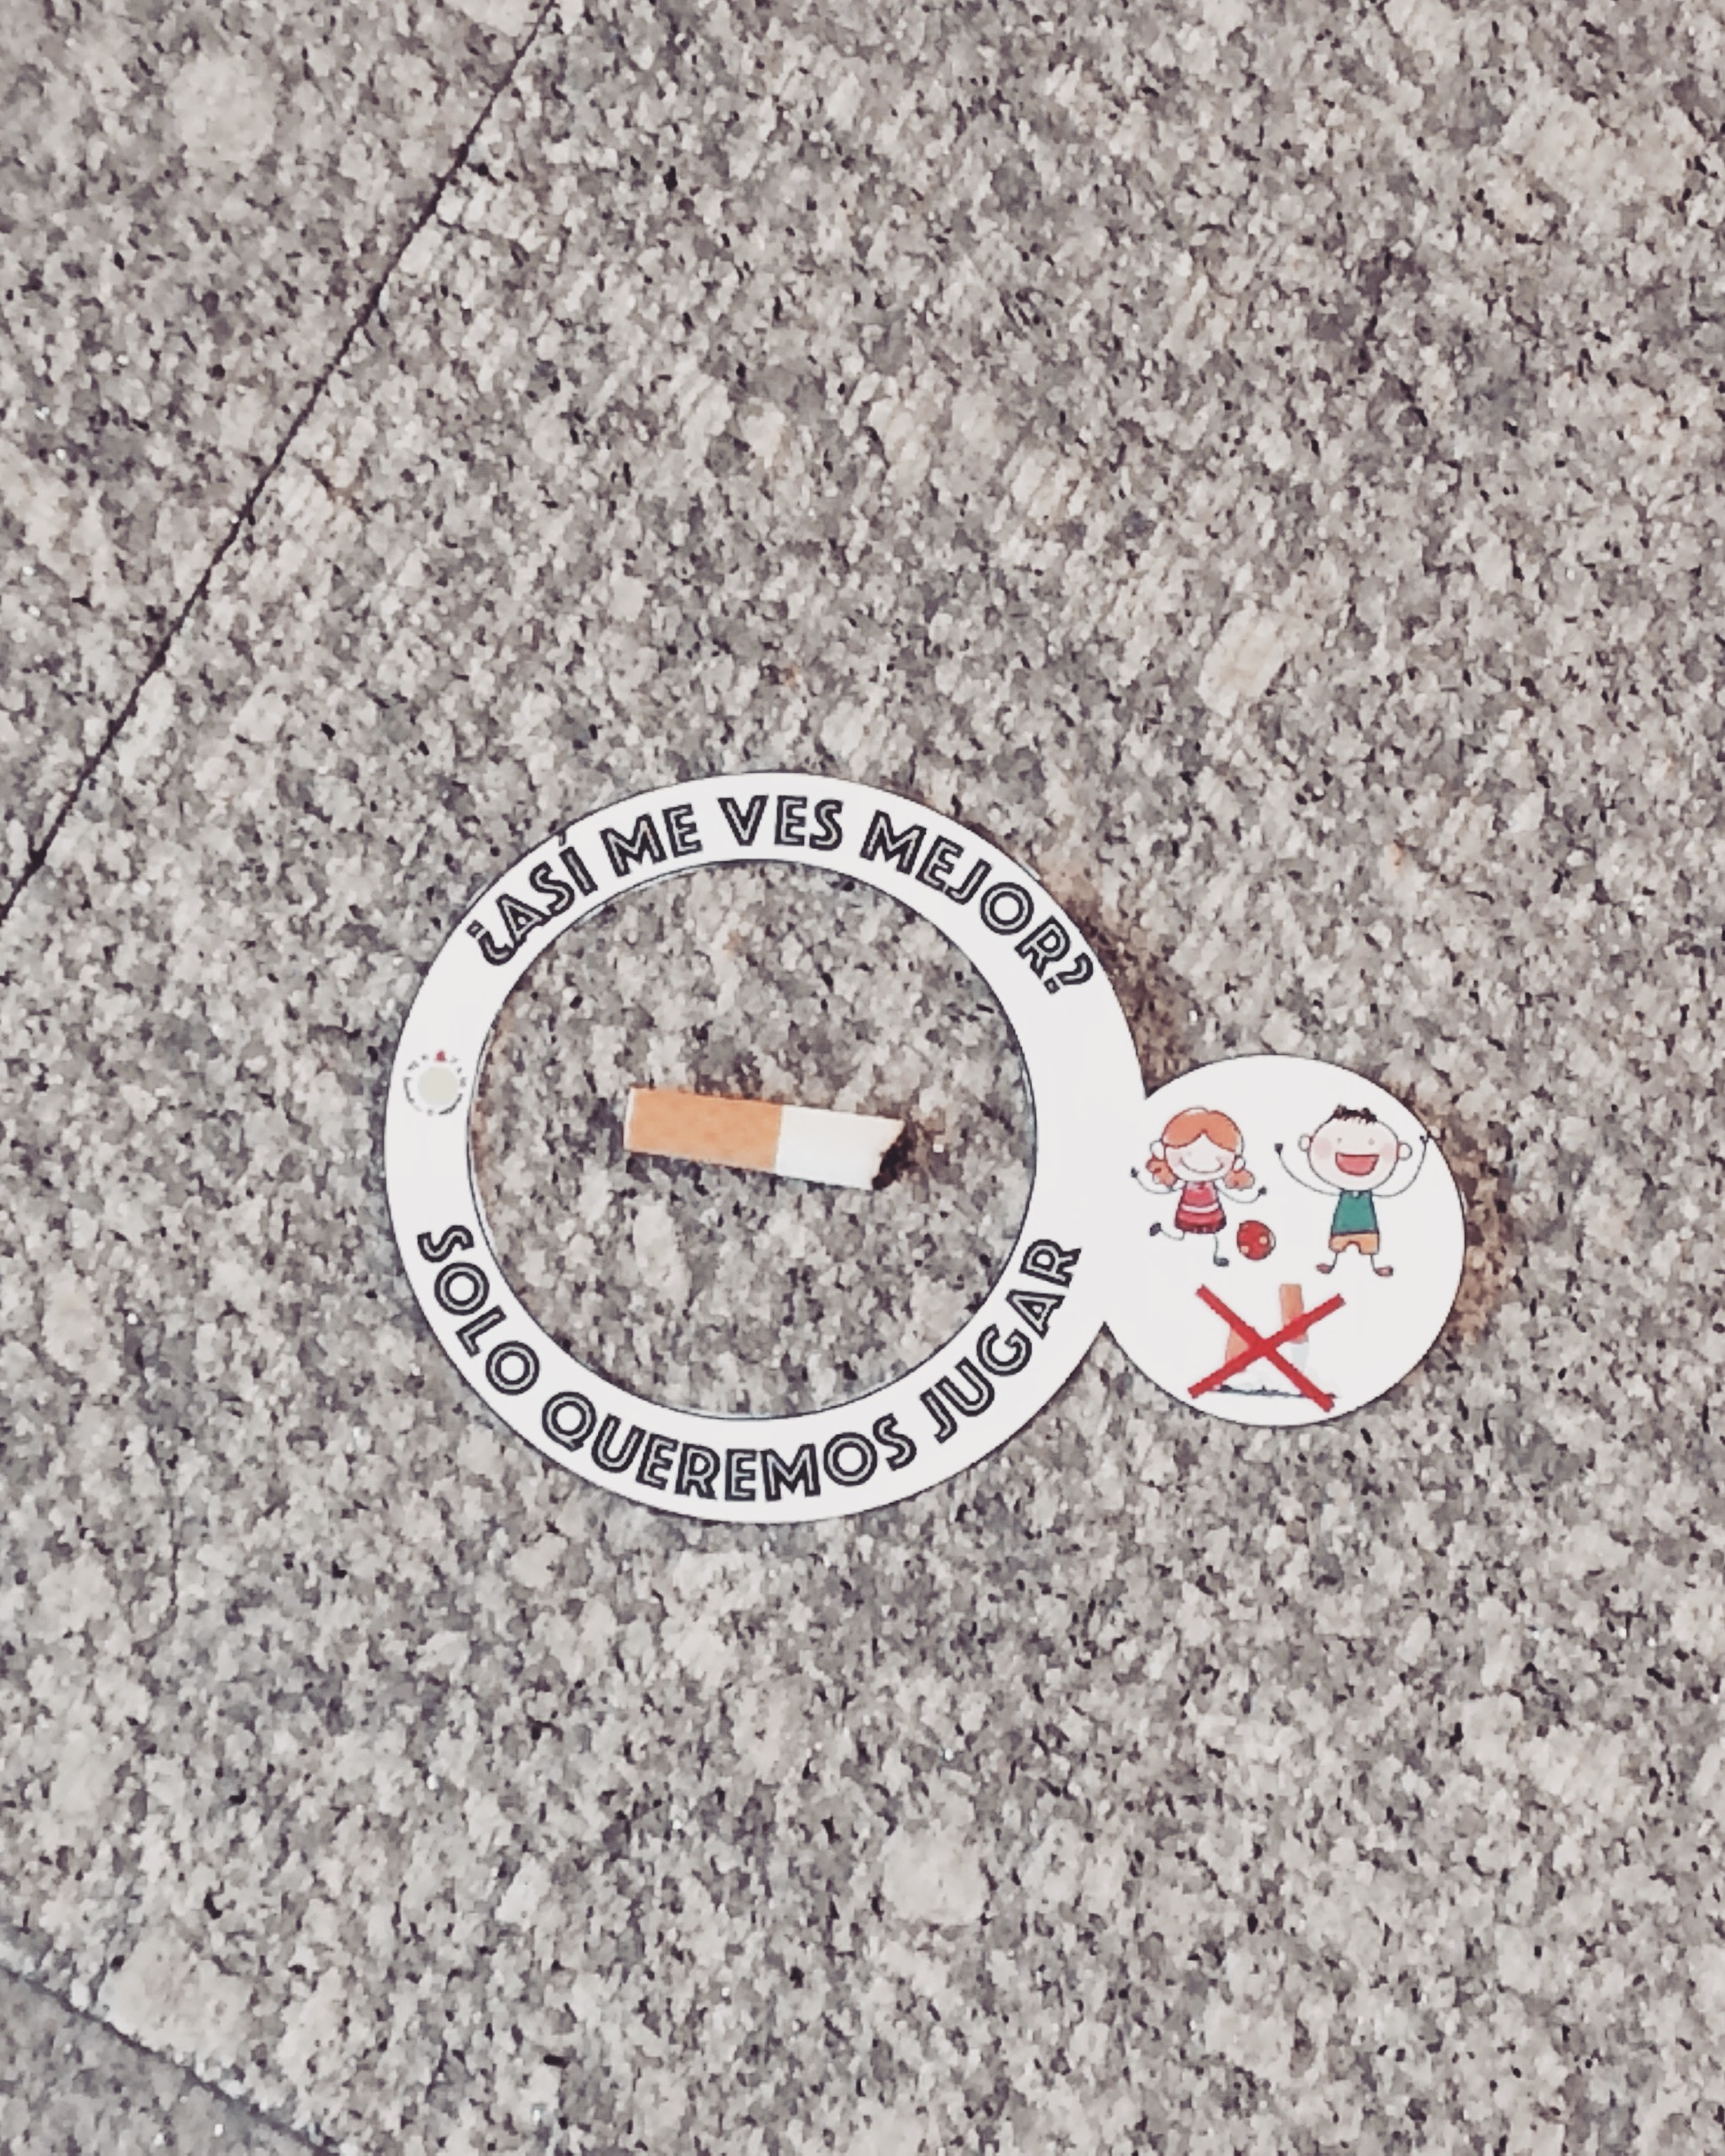 #STOPCOLILLAS